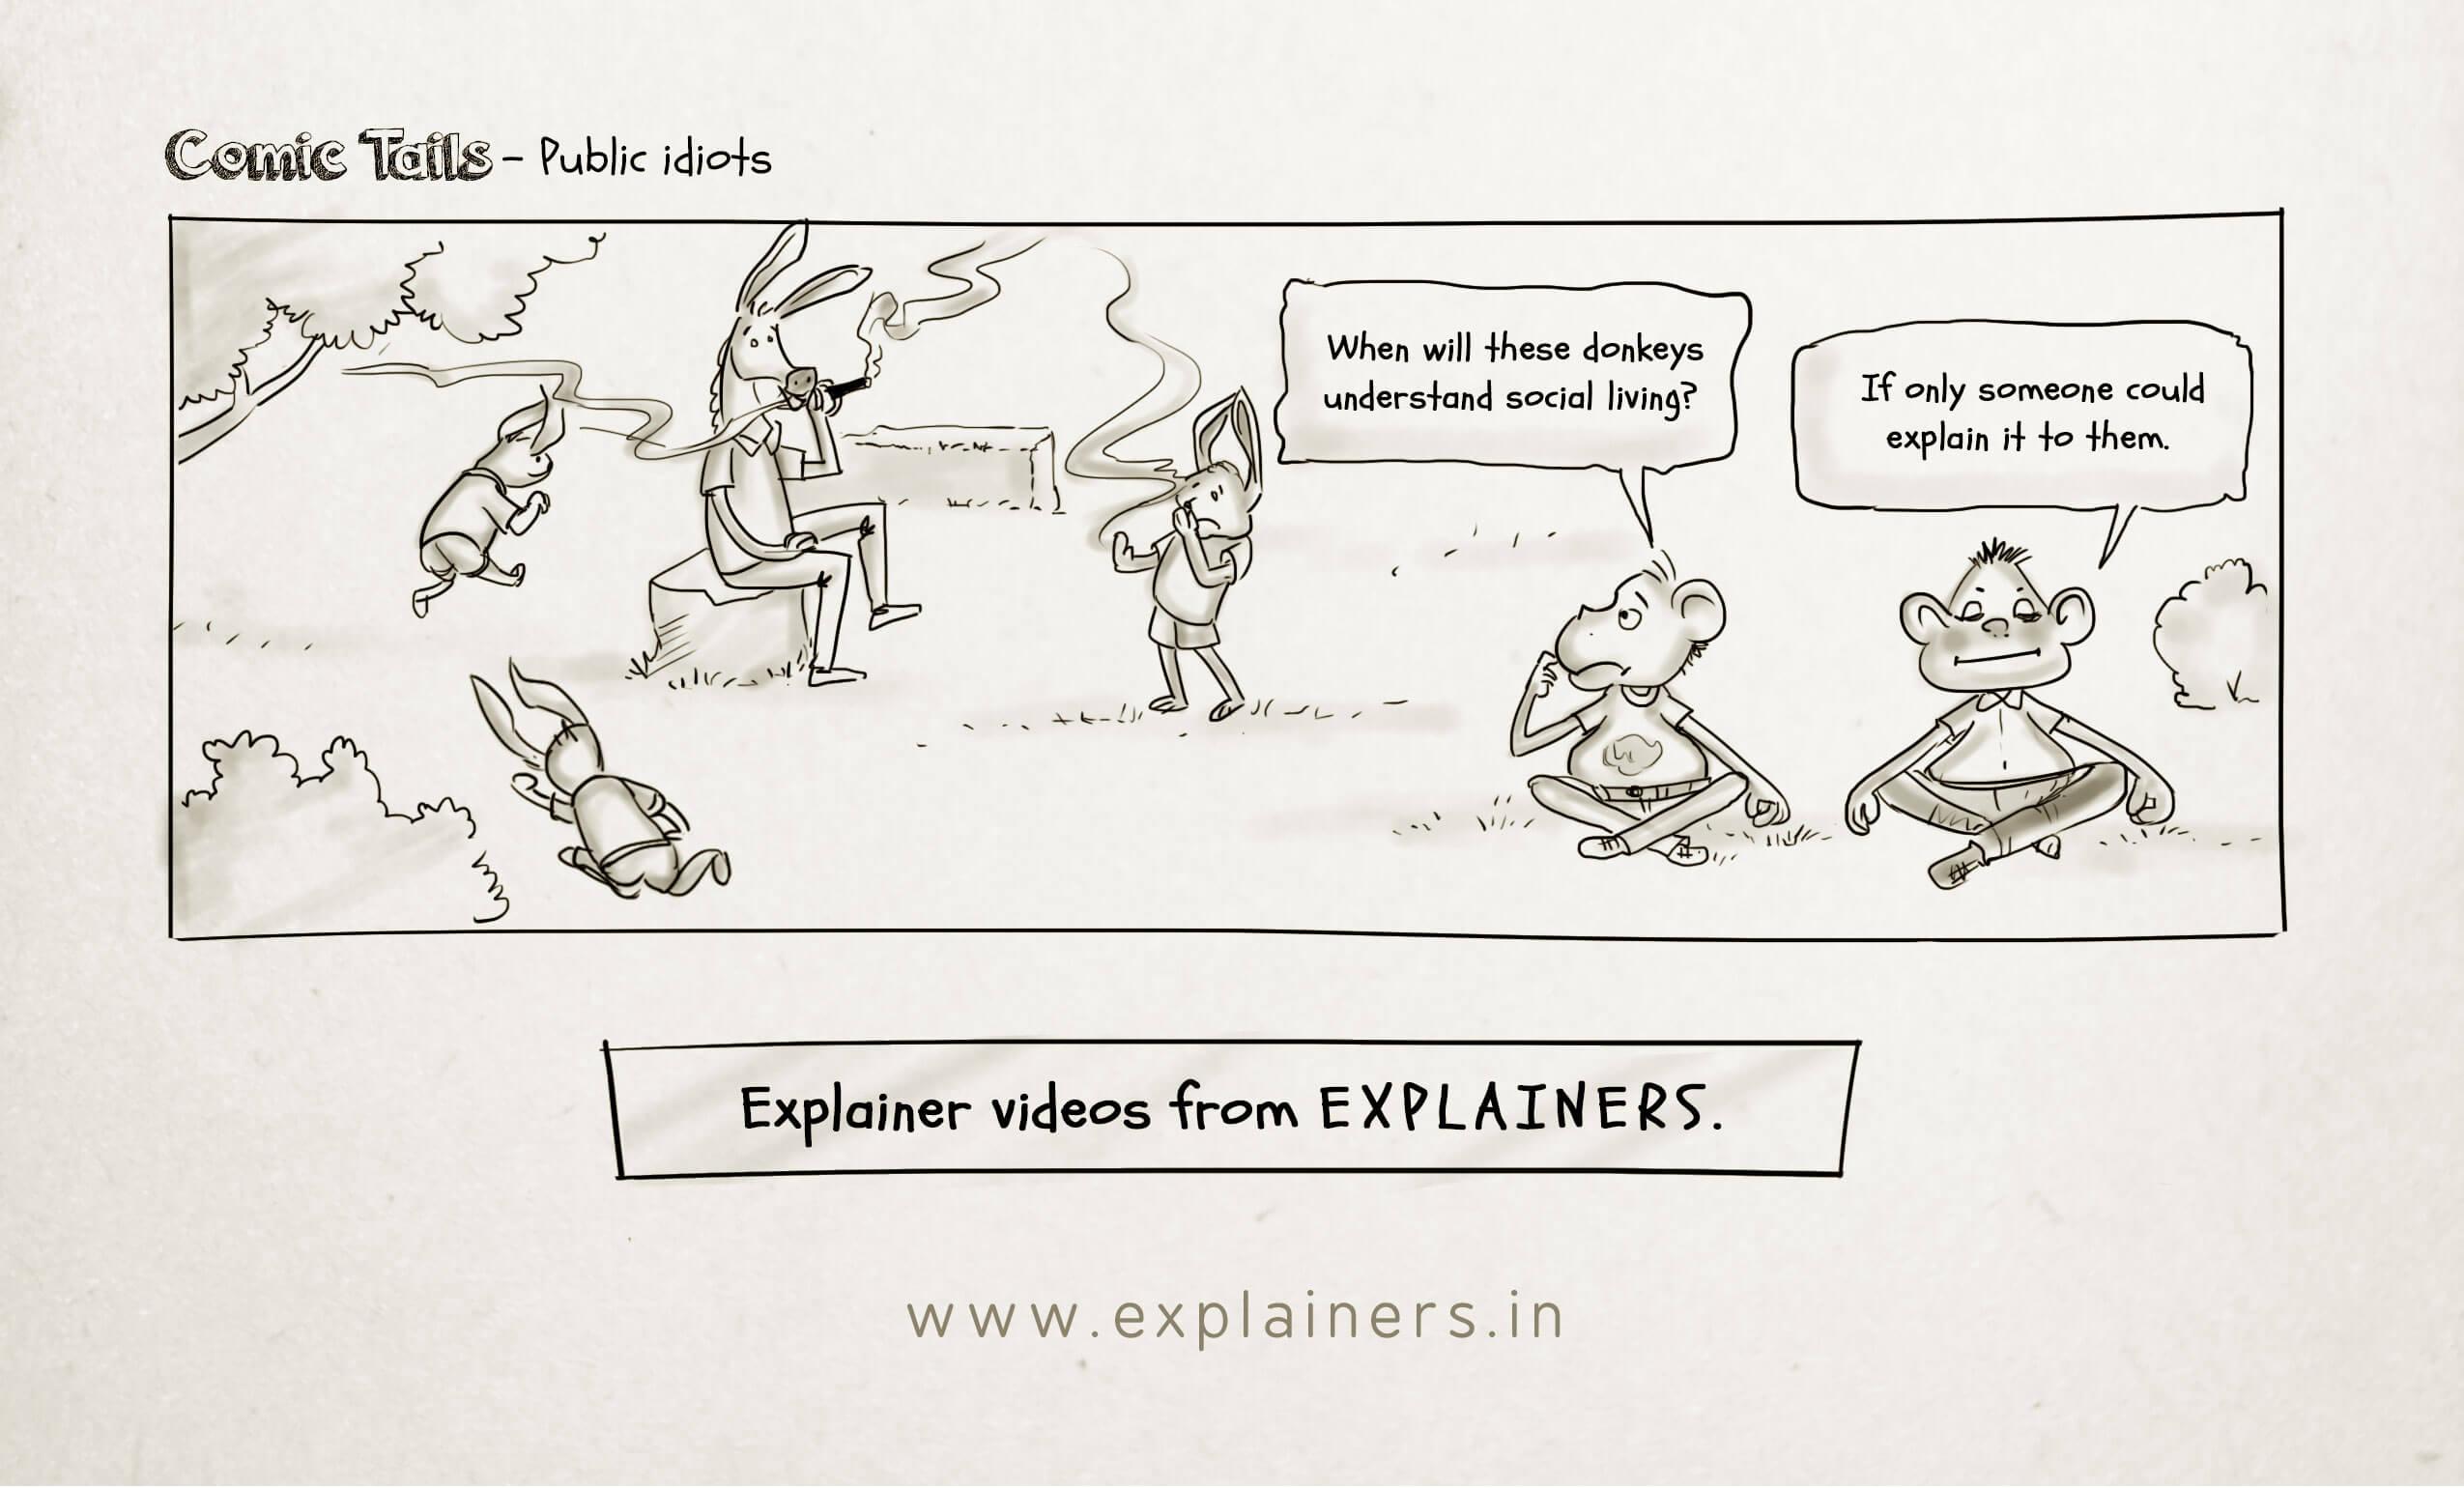 Comic Tails - Public idiots